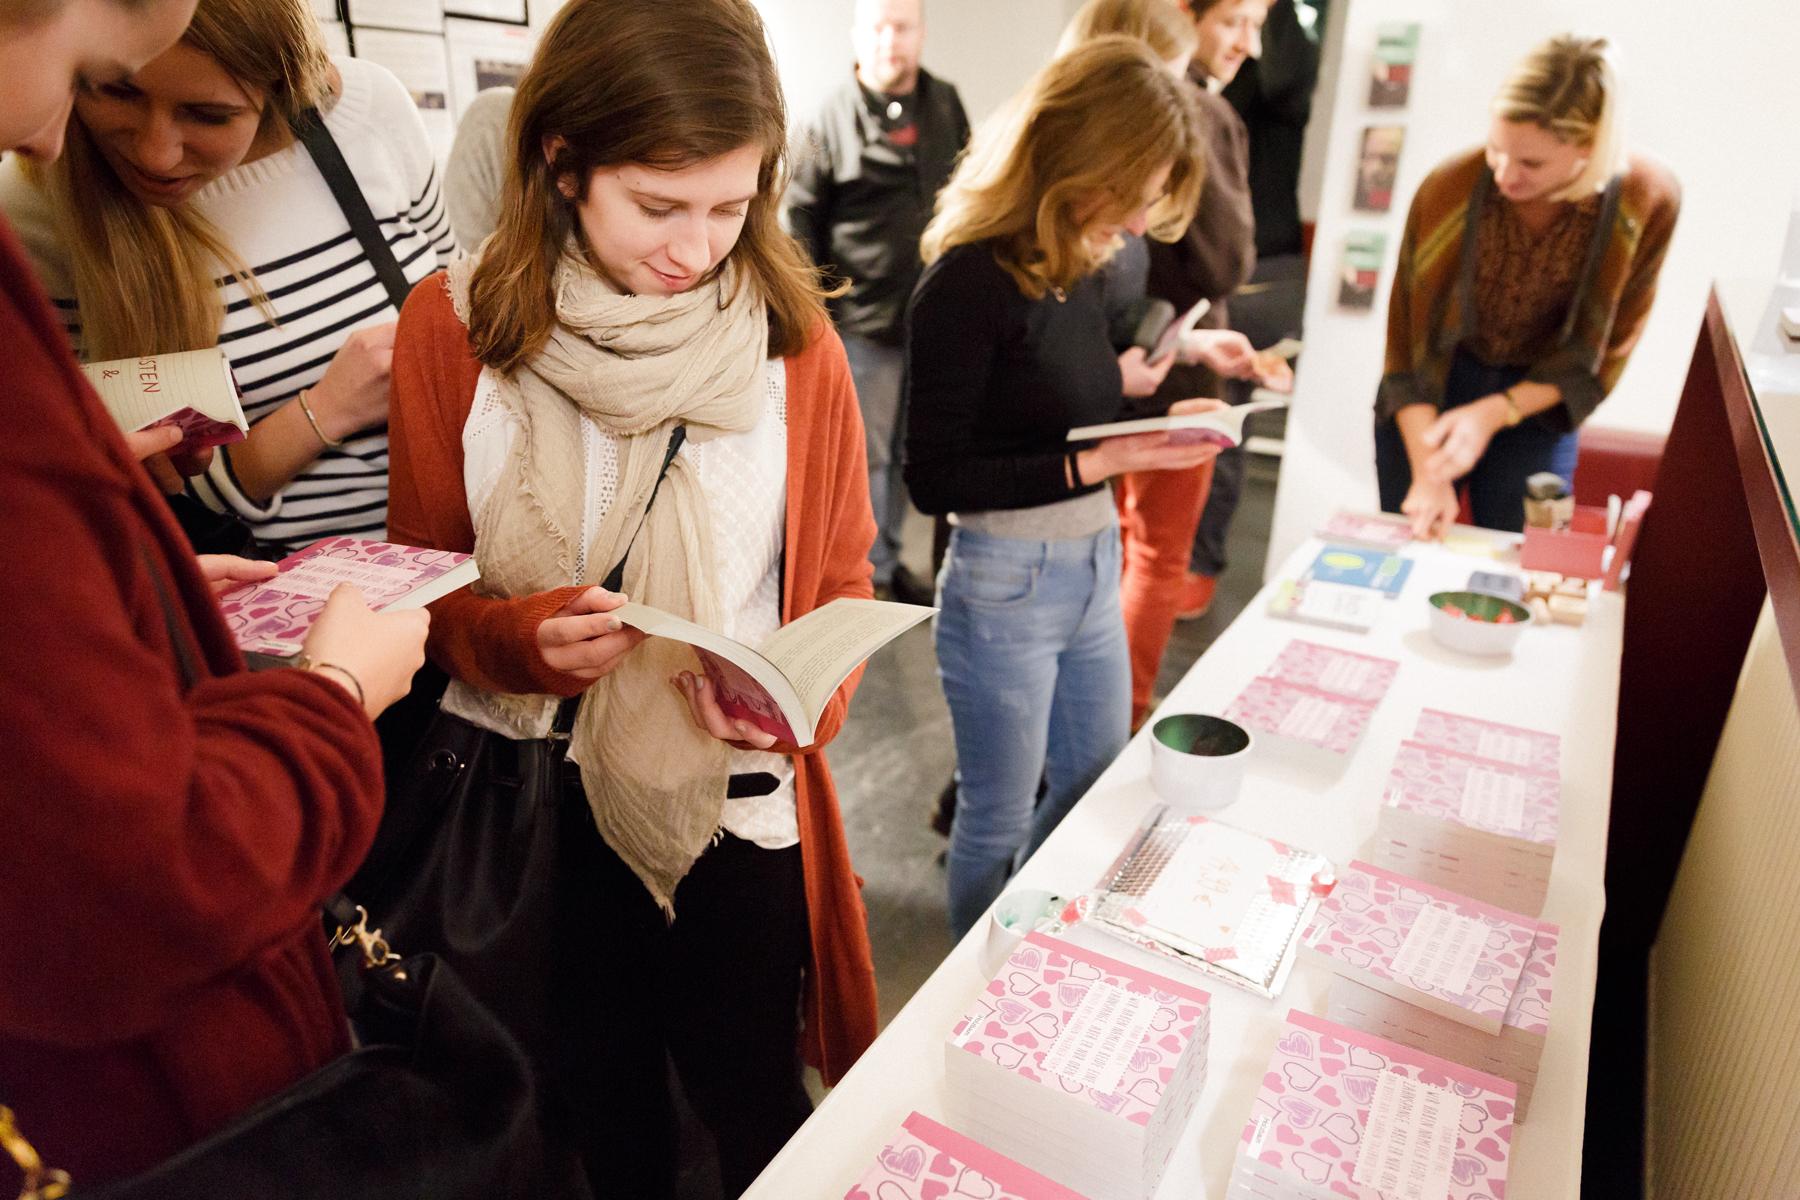 17-11-26 TAGebuch Slam Buchpräsentation_©anna konrath_31.jpg